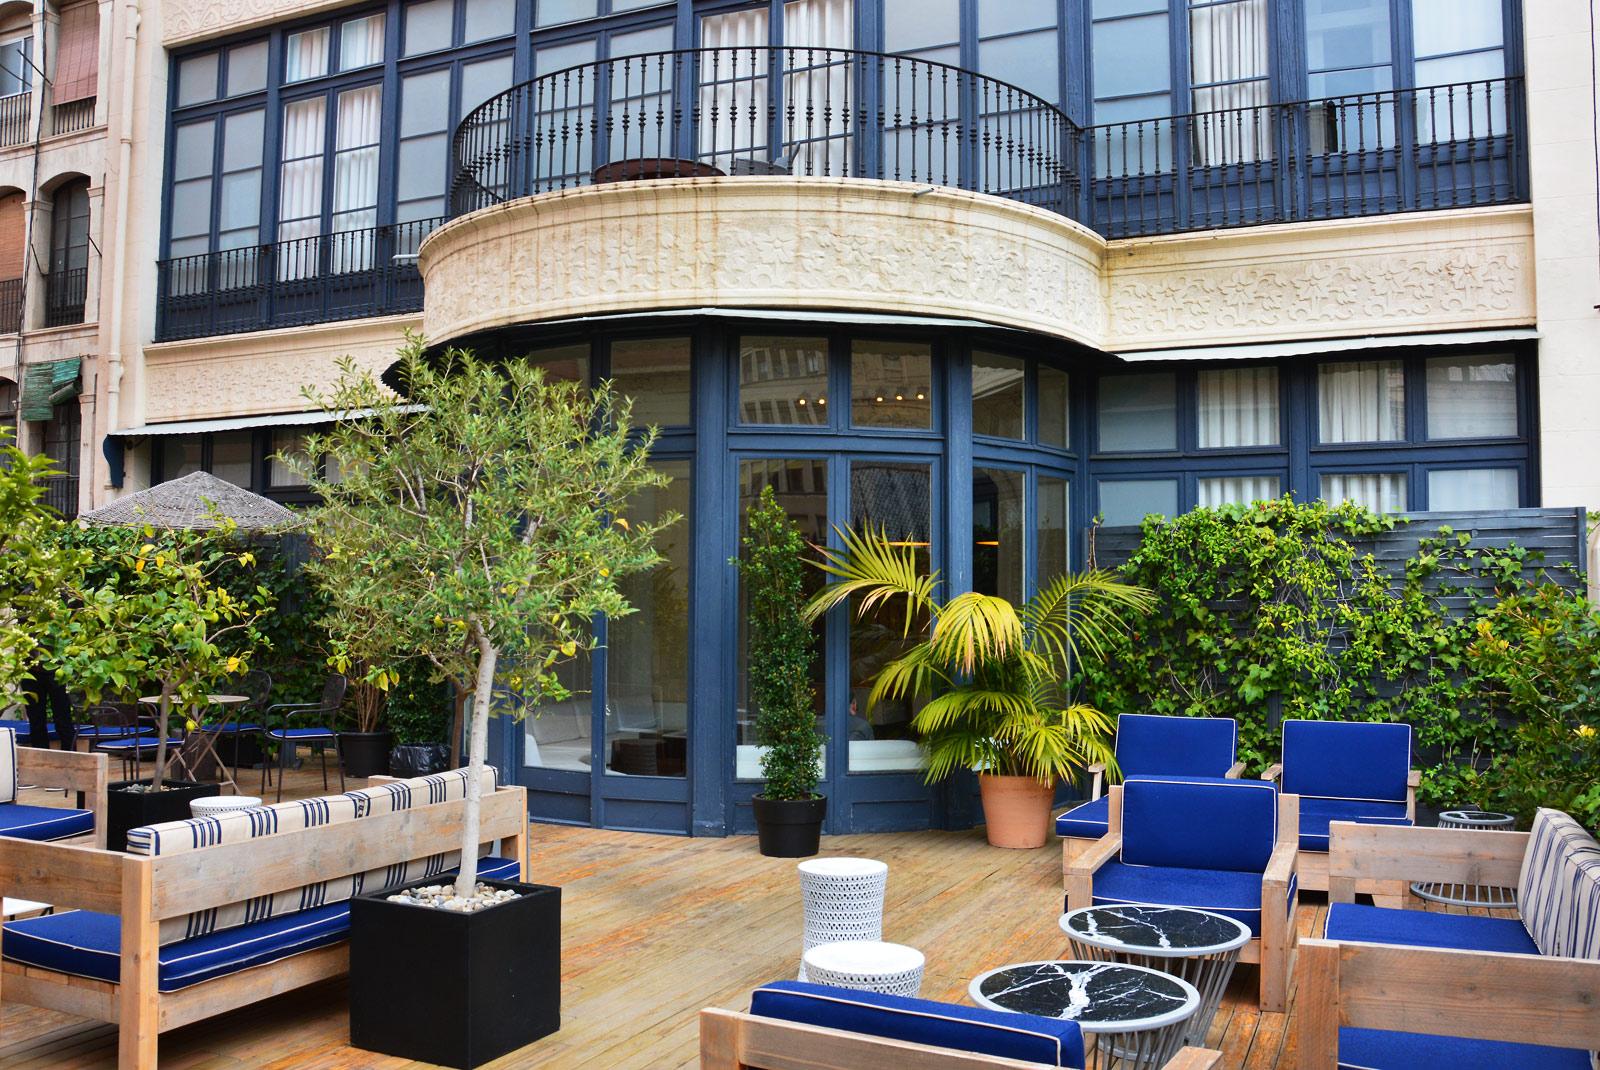 praktik rambla hotel egy igaz n autentikus sz ll s barcelon ban vil gutaz. Black Bedroom Furniture Sets. Home Design Ideas